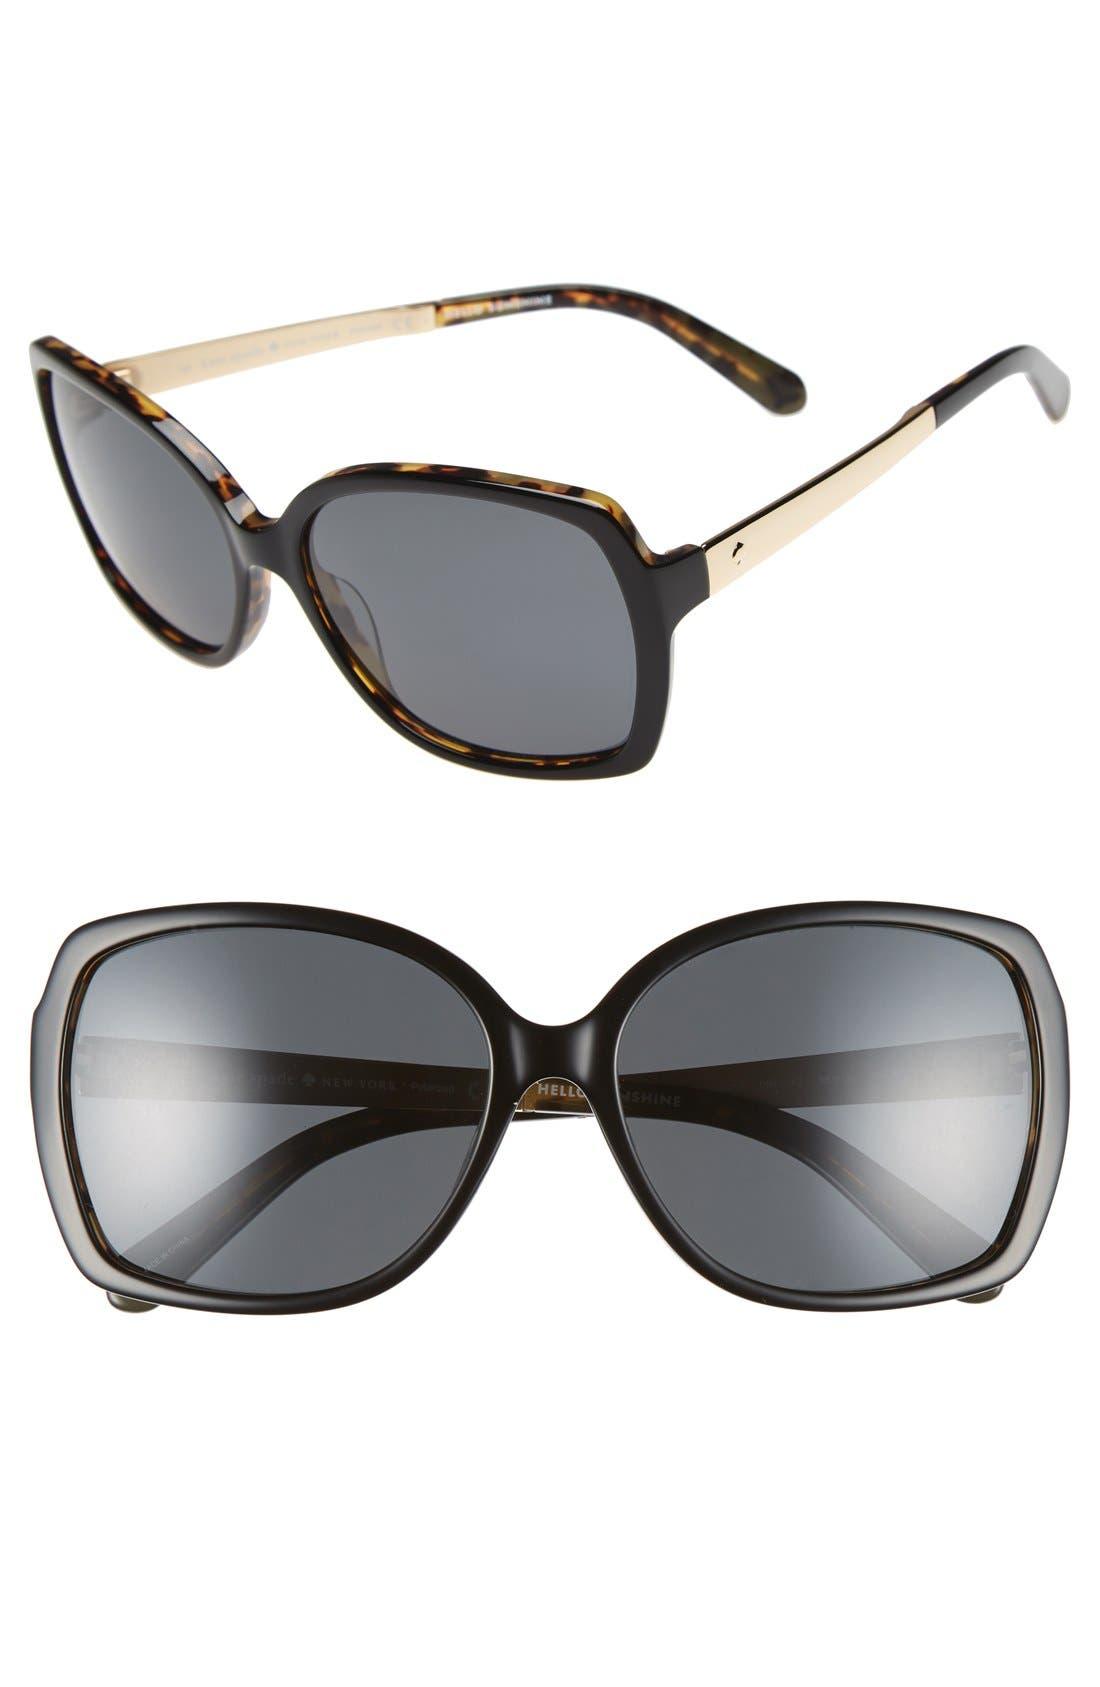 KATE SPADE NEW YORK,                             'darilynn' 58mm polarized sunglasses,                             Main thumbnail 1, color,                             001